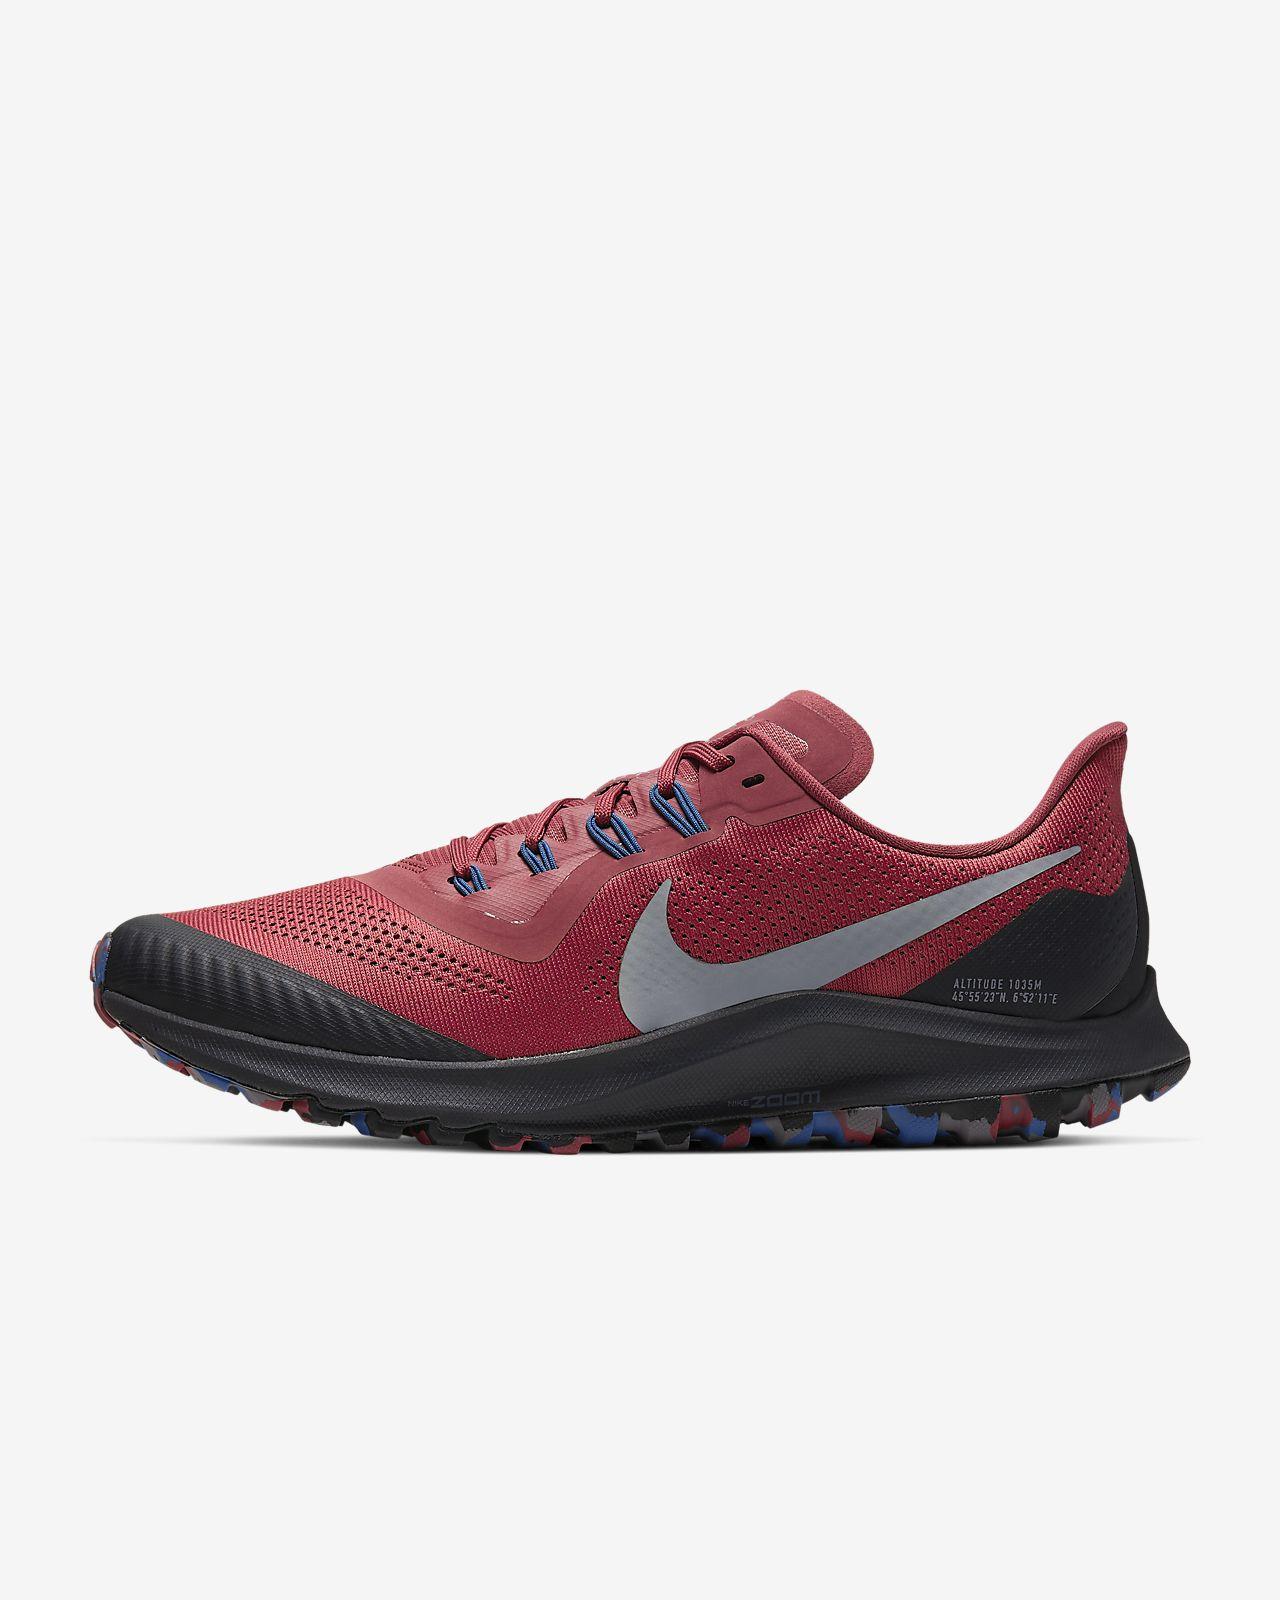 Мужские кроссовки для трейлраннинга Nike Pegasus Trail